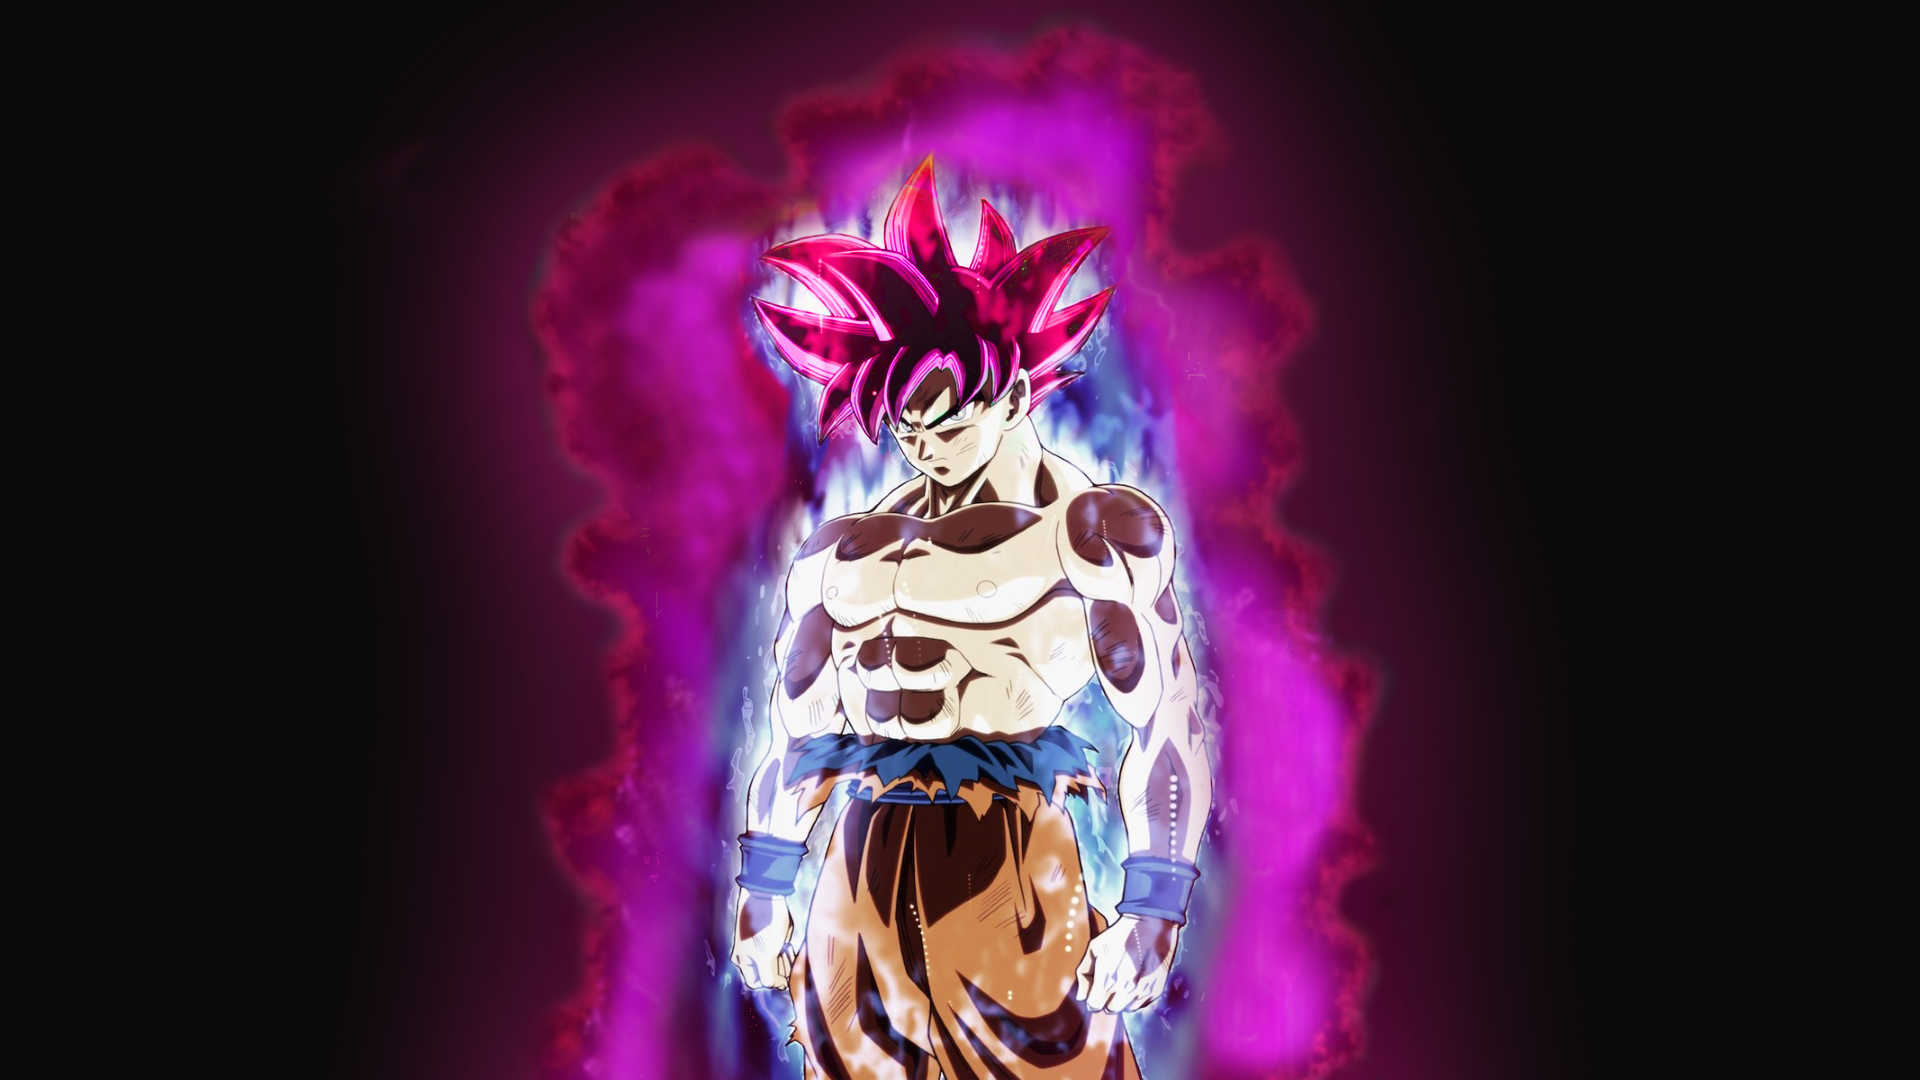 Son Goku Dragon Ball Dragon Ball Super Black Goku Rose Wallpaper Resolution 1920x1080 Id 521334 Wallha Com